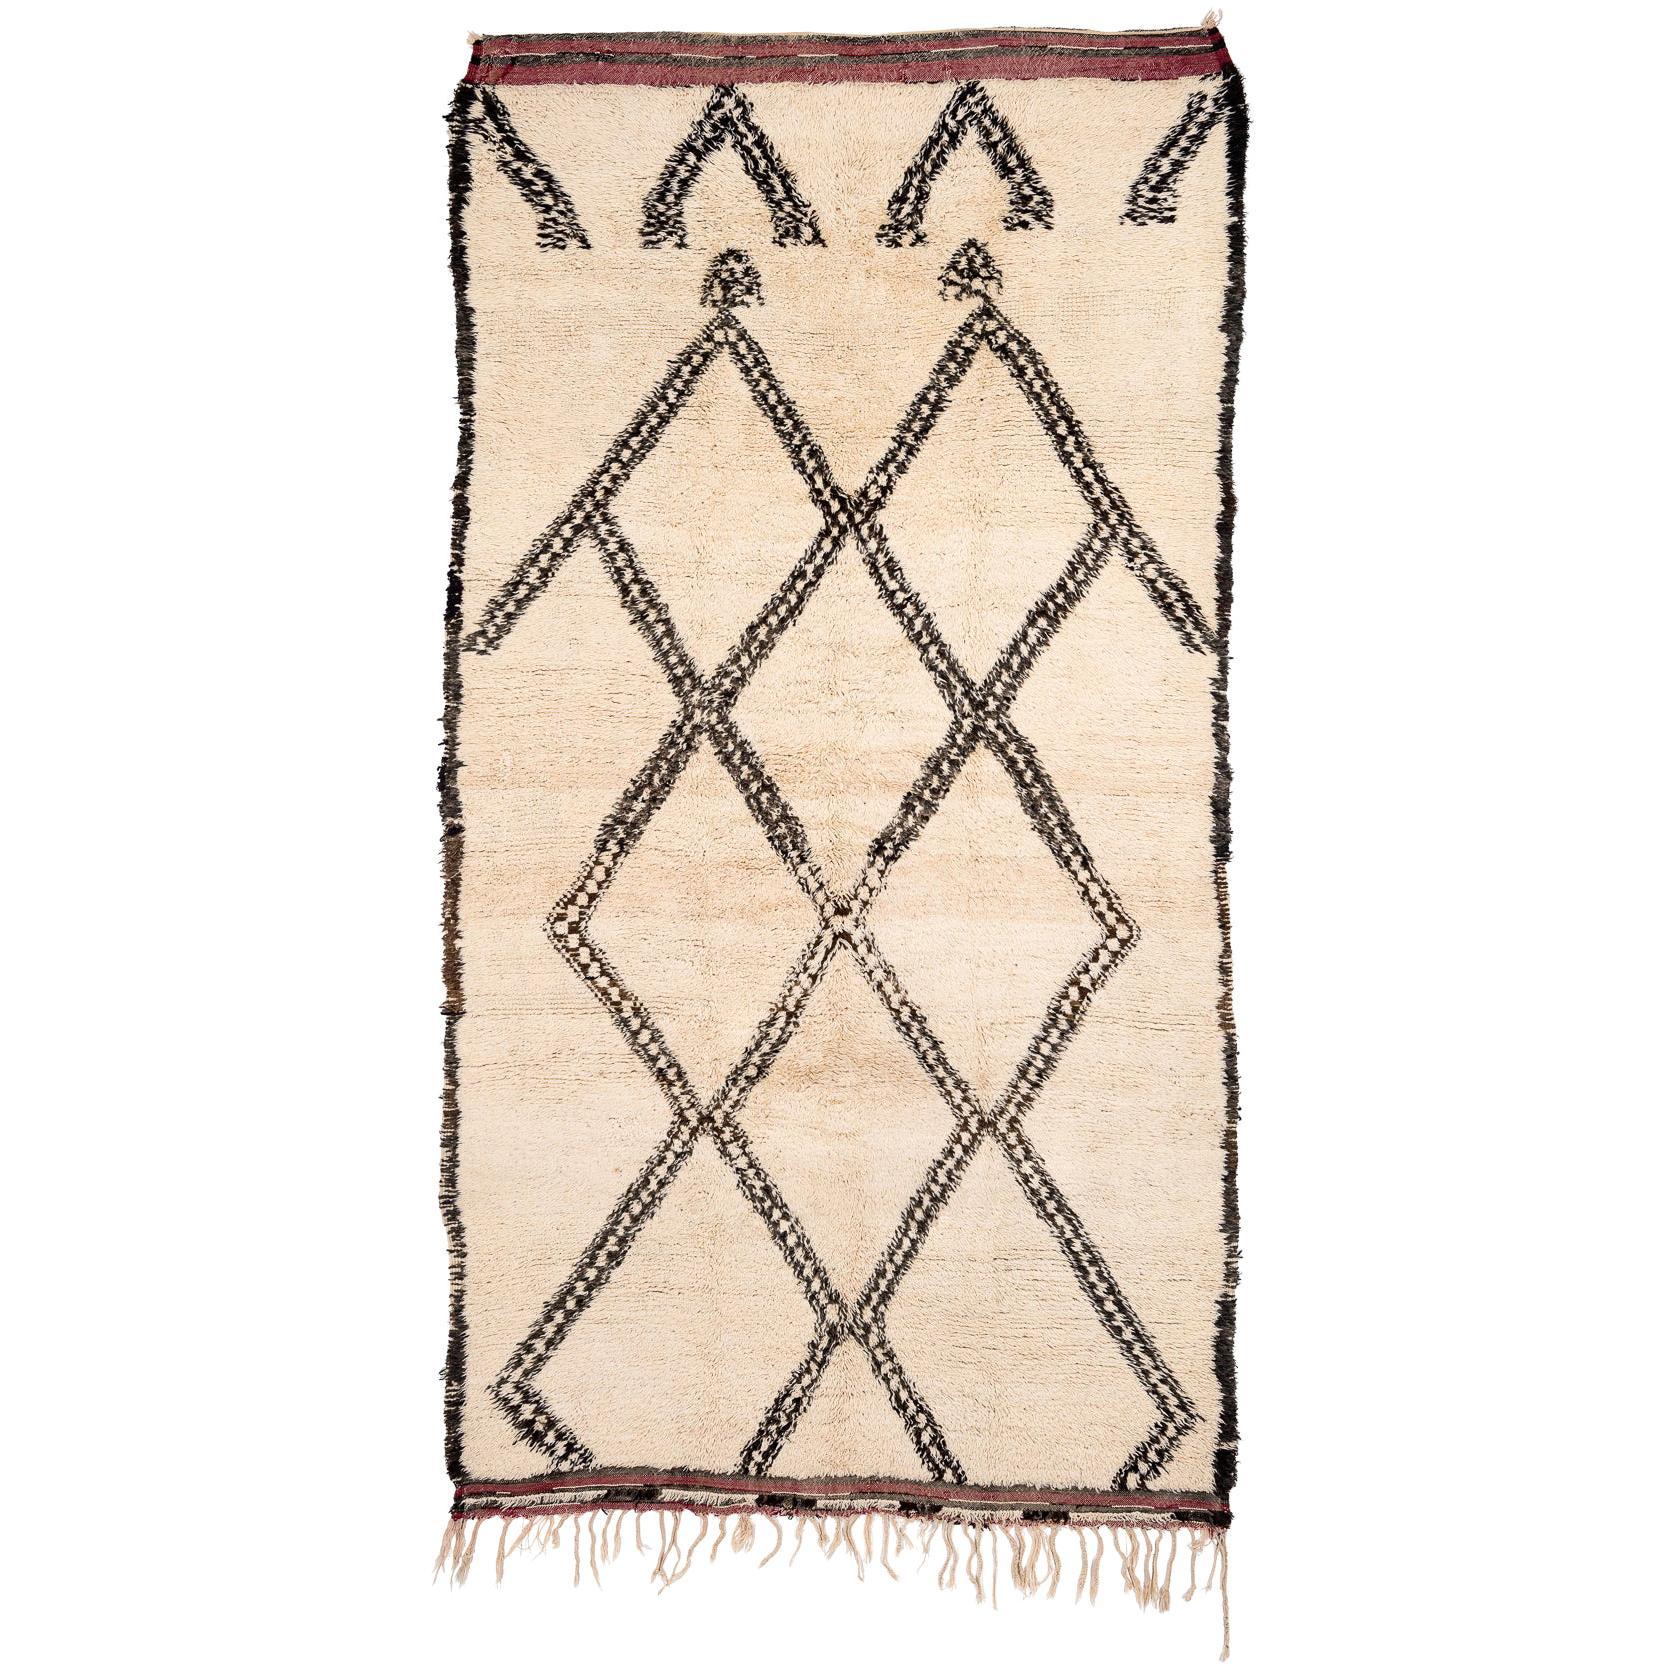 Vintage Beni Ouarain Morocan Berber Tribal Rug